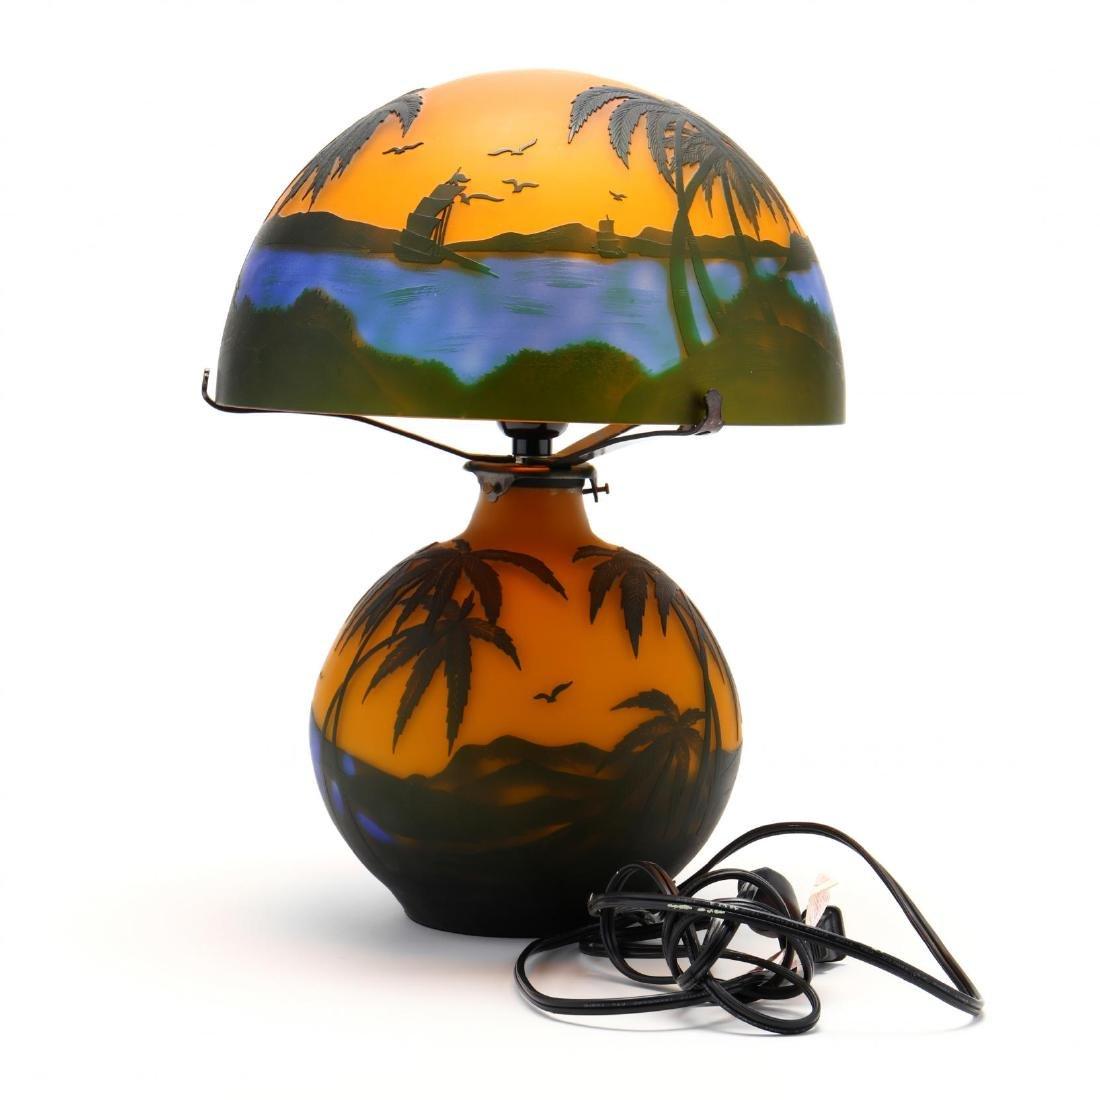 after Gallé, Cameo Glass Table Lamp - 3